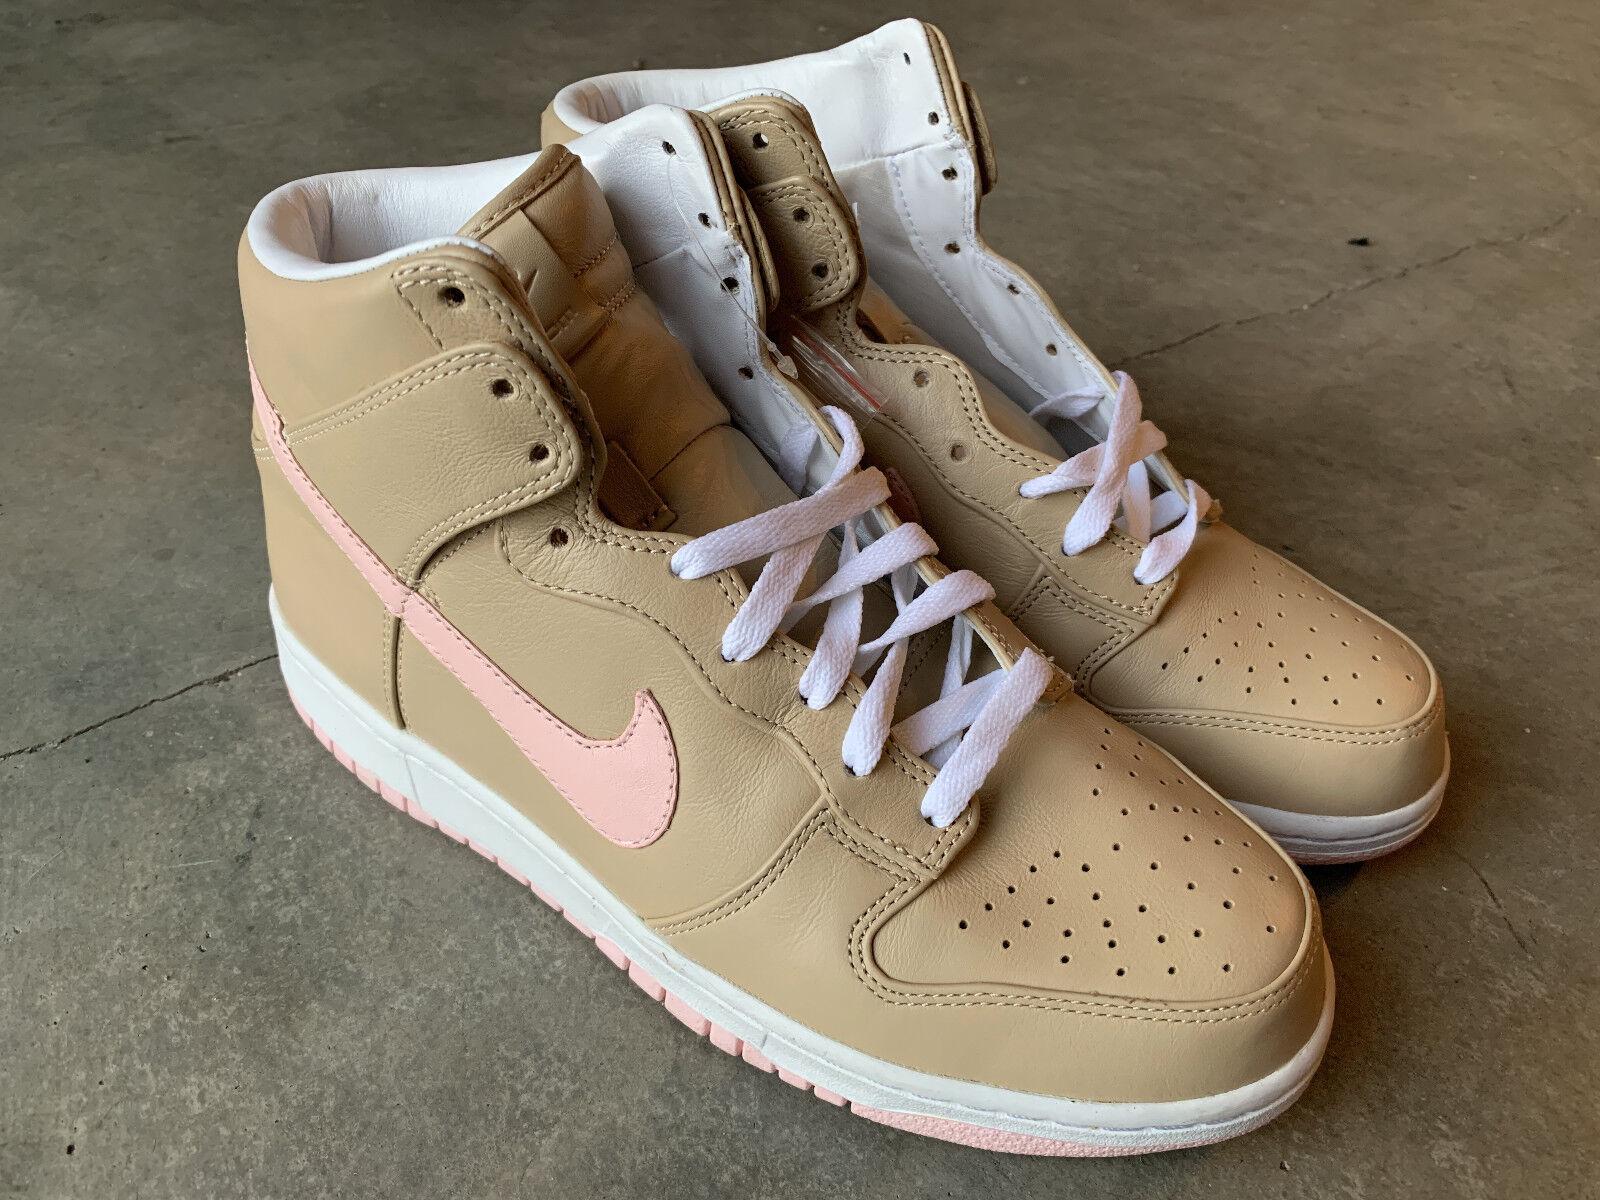 Nike Dunk Premium High SP Linen 624512 200 Size 9